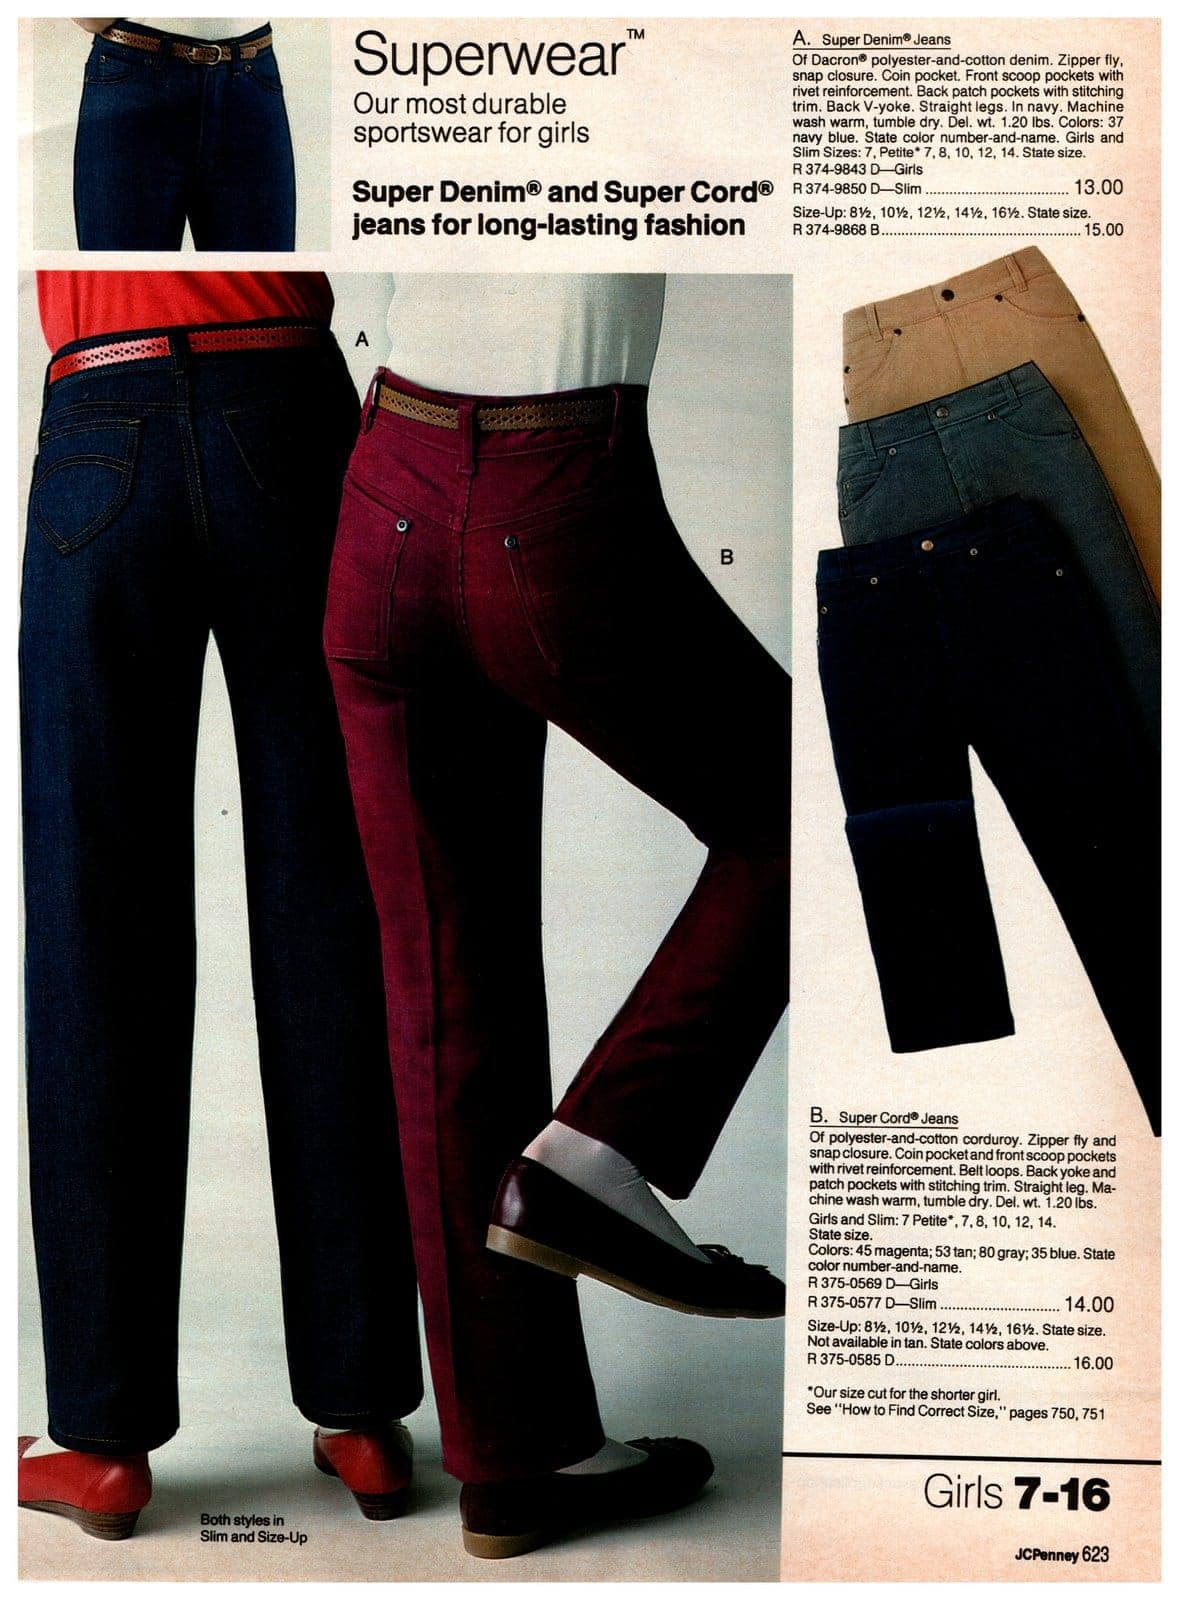 Super denim and super cord jeans for long-lasting sportswear fashion